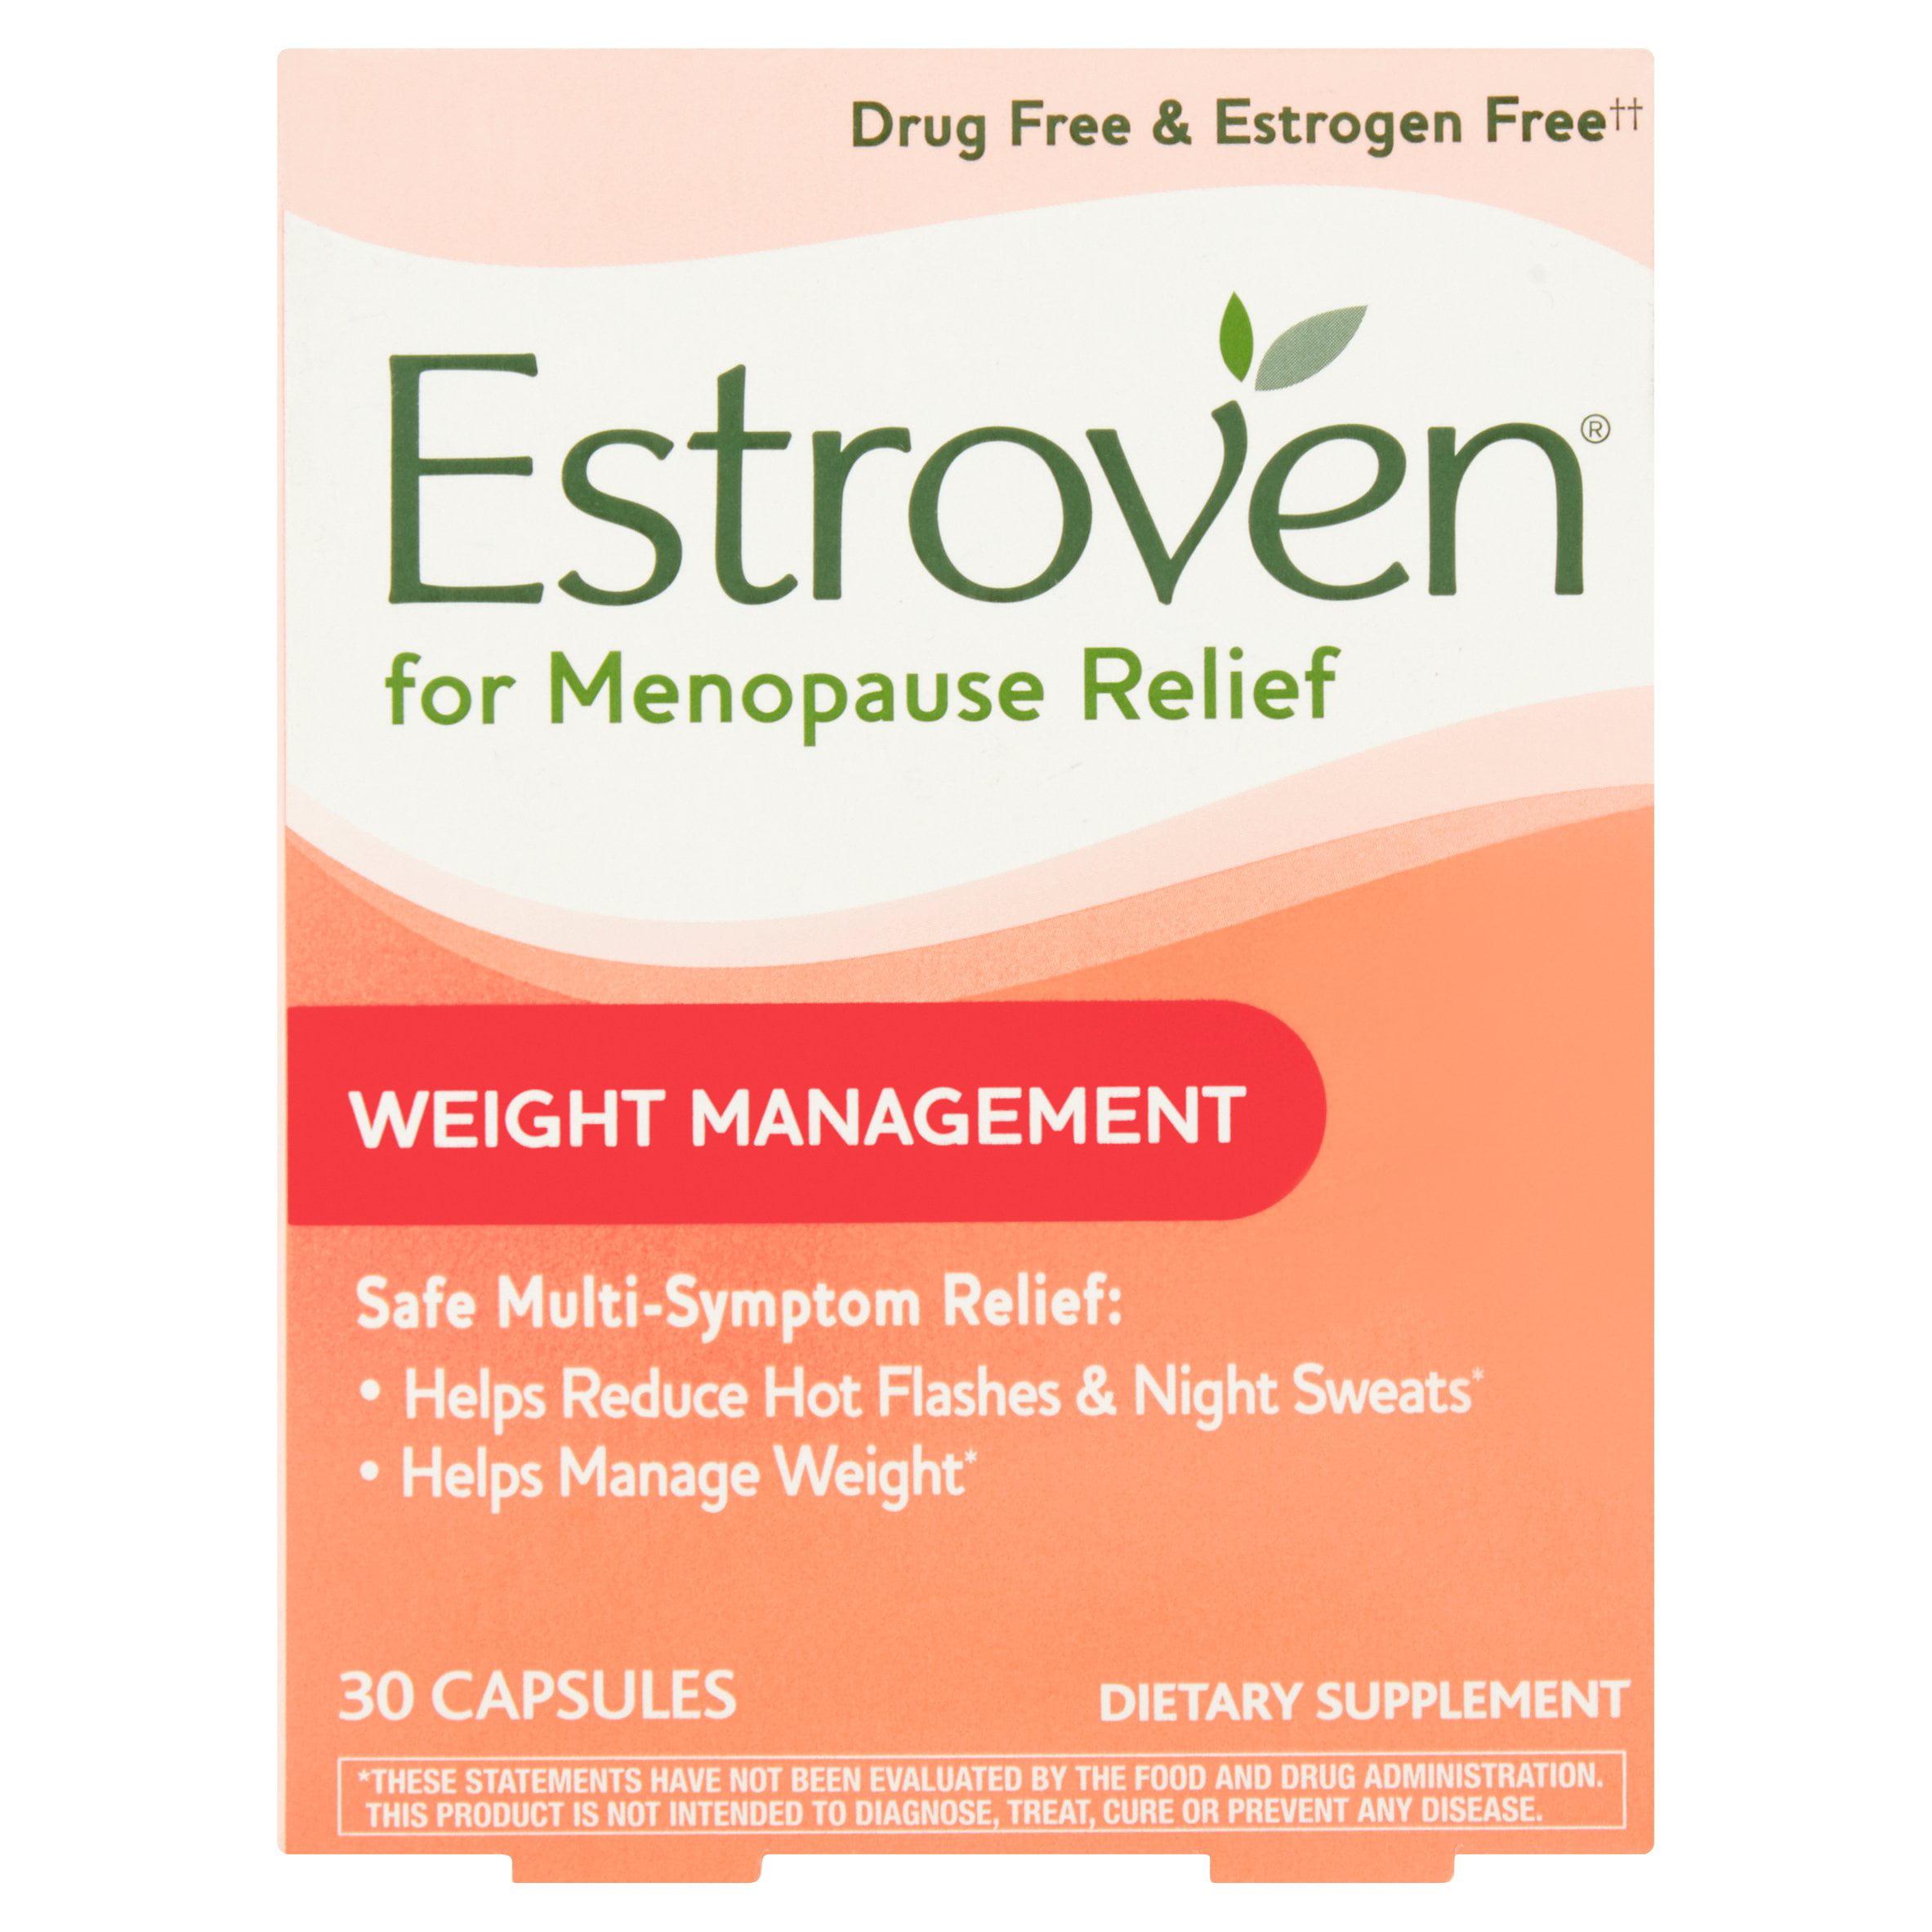 Estroven Weight Management Menopause Relief Capsules, 30 Ct